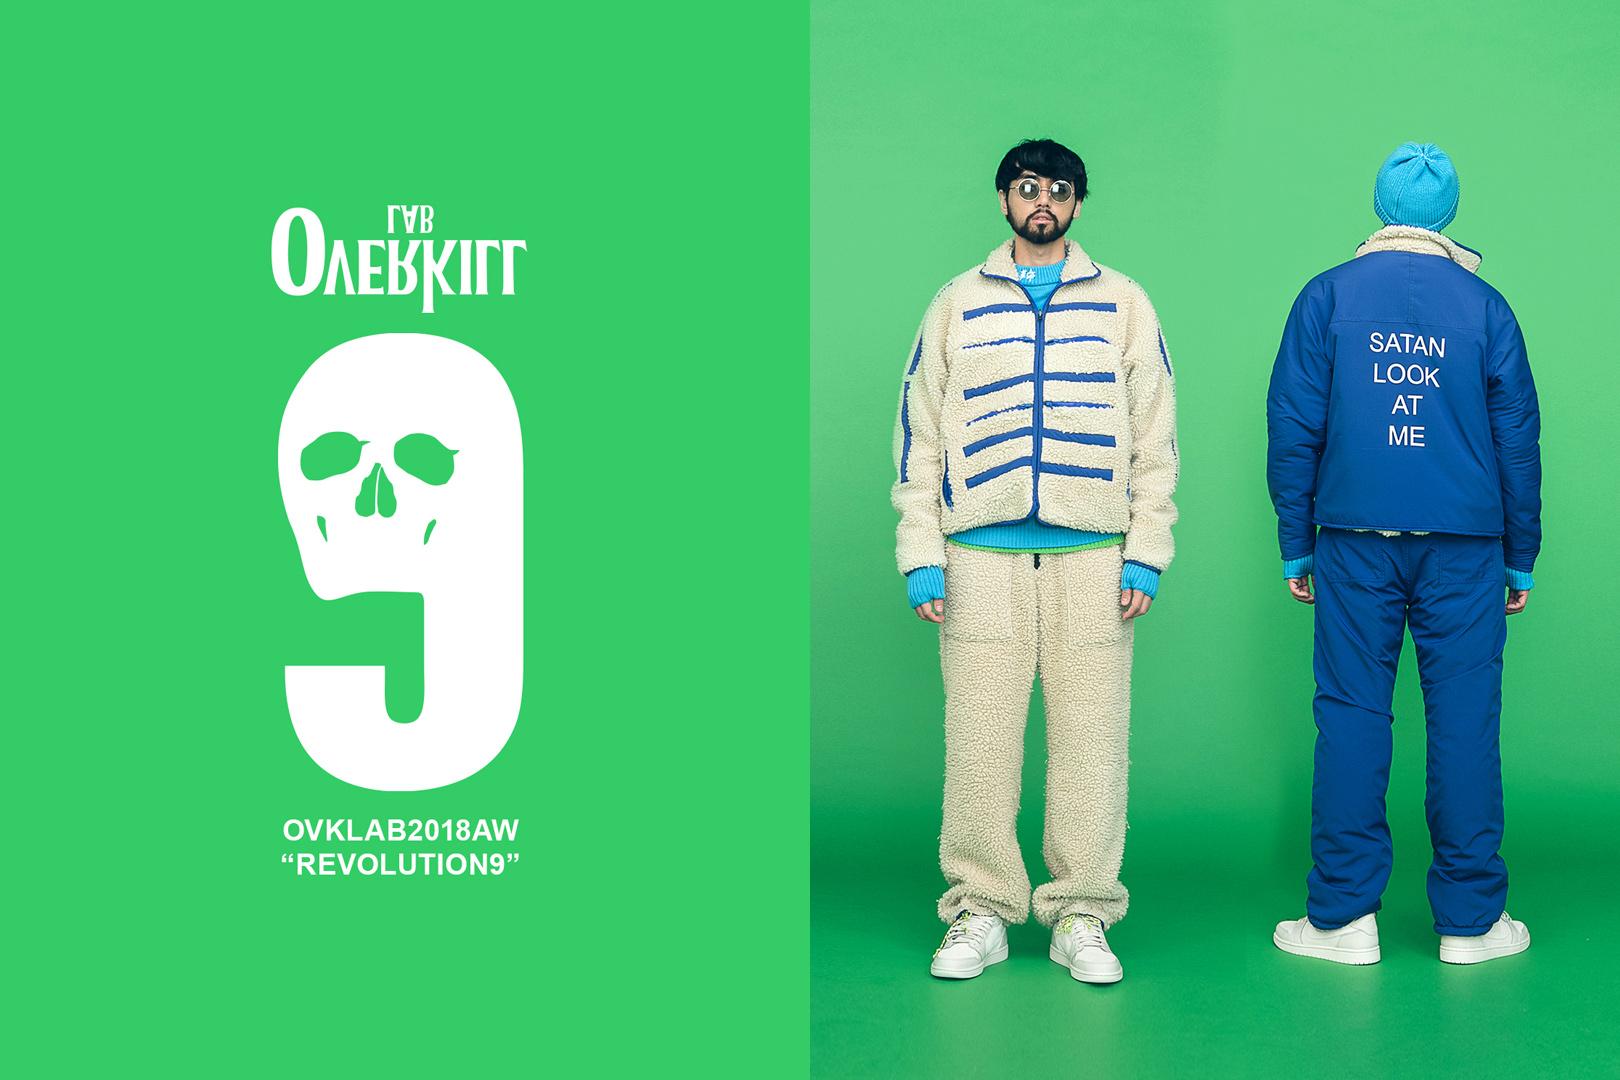 ovklab-2018aw-06